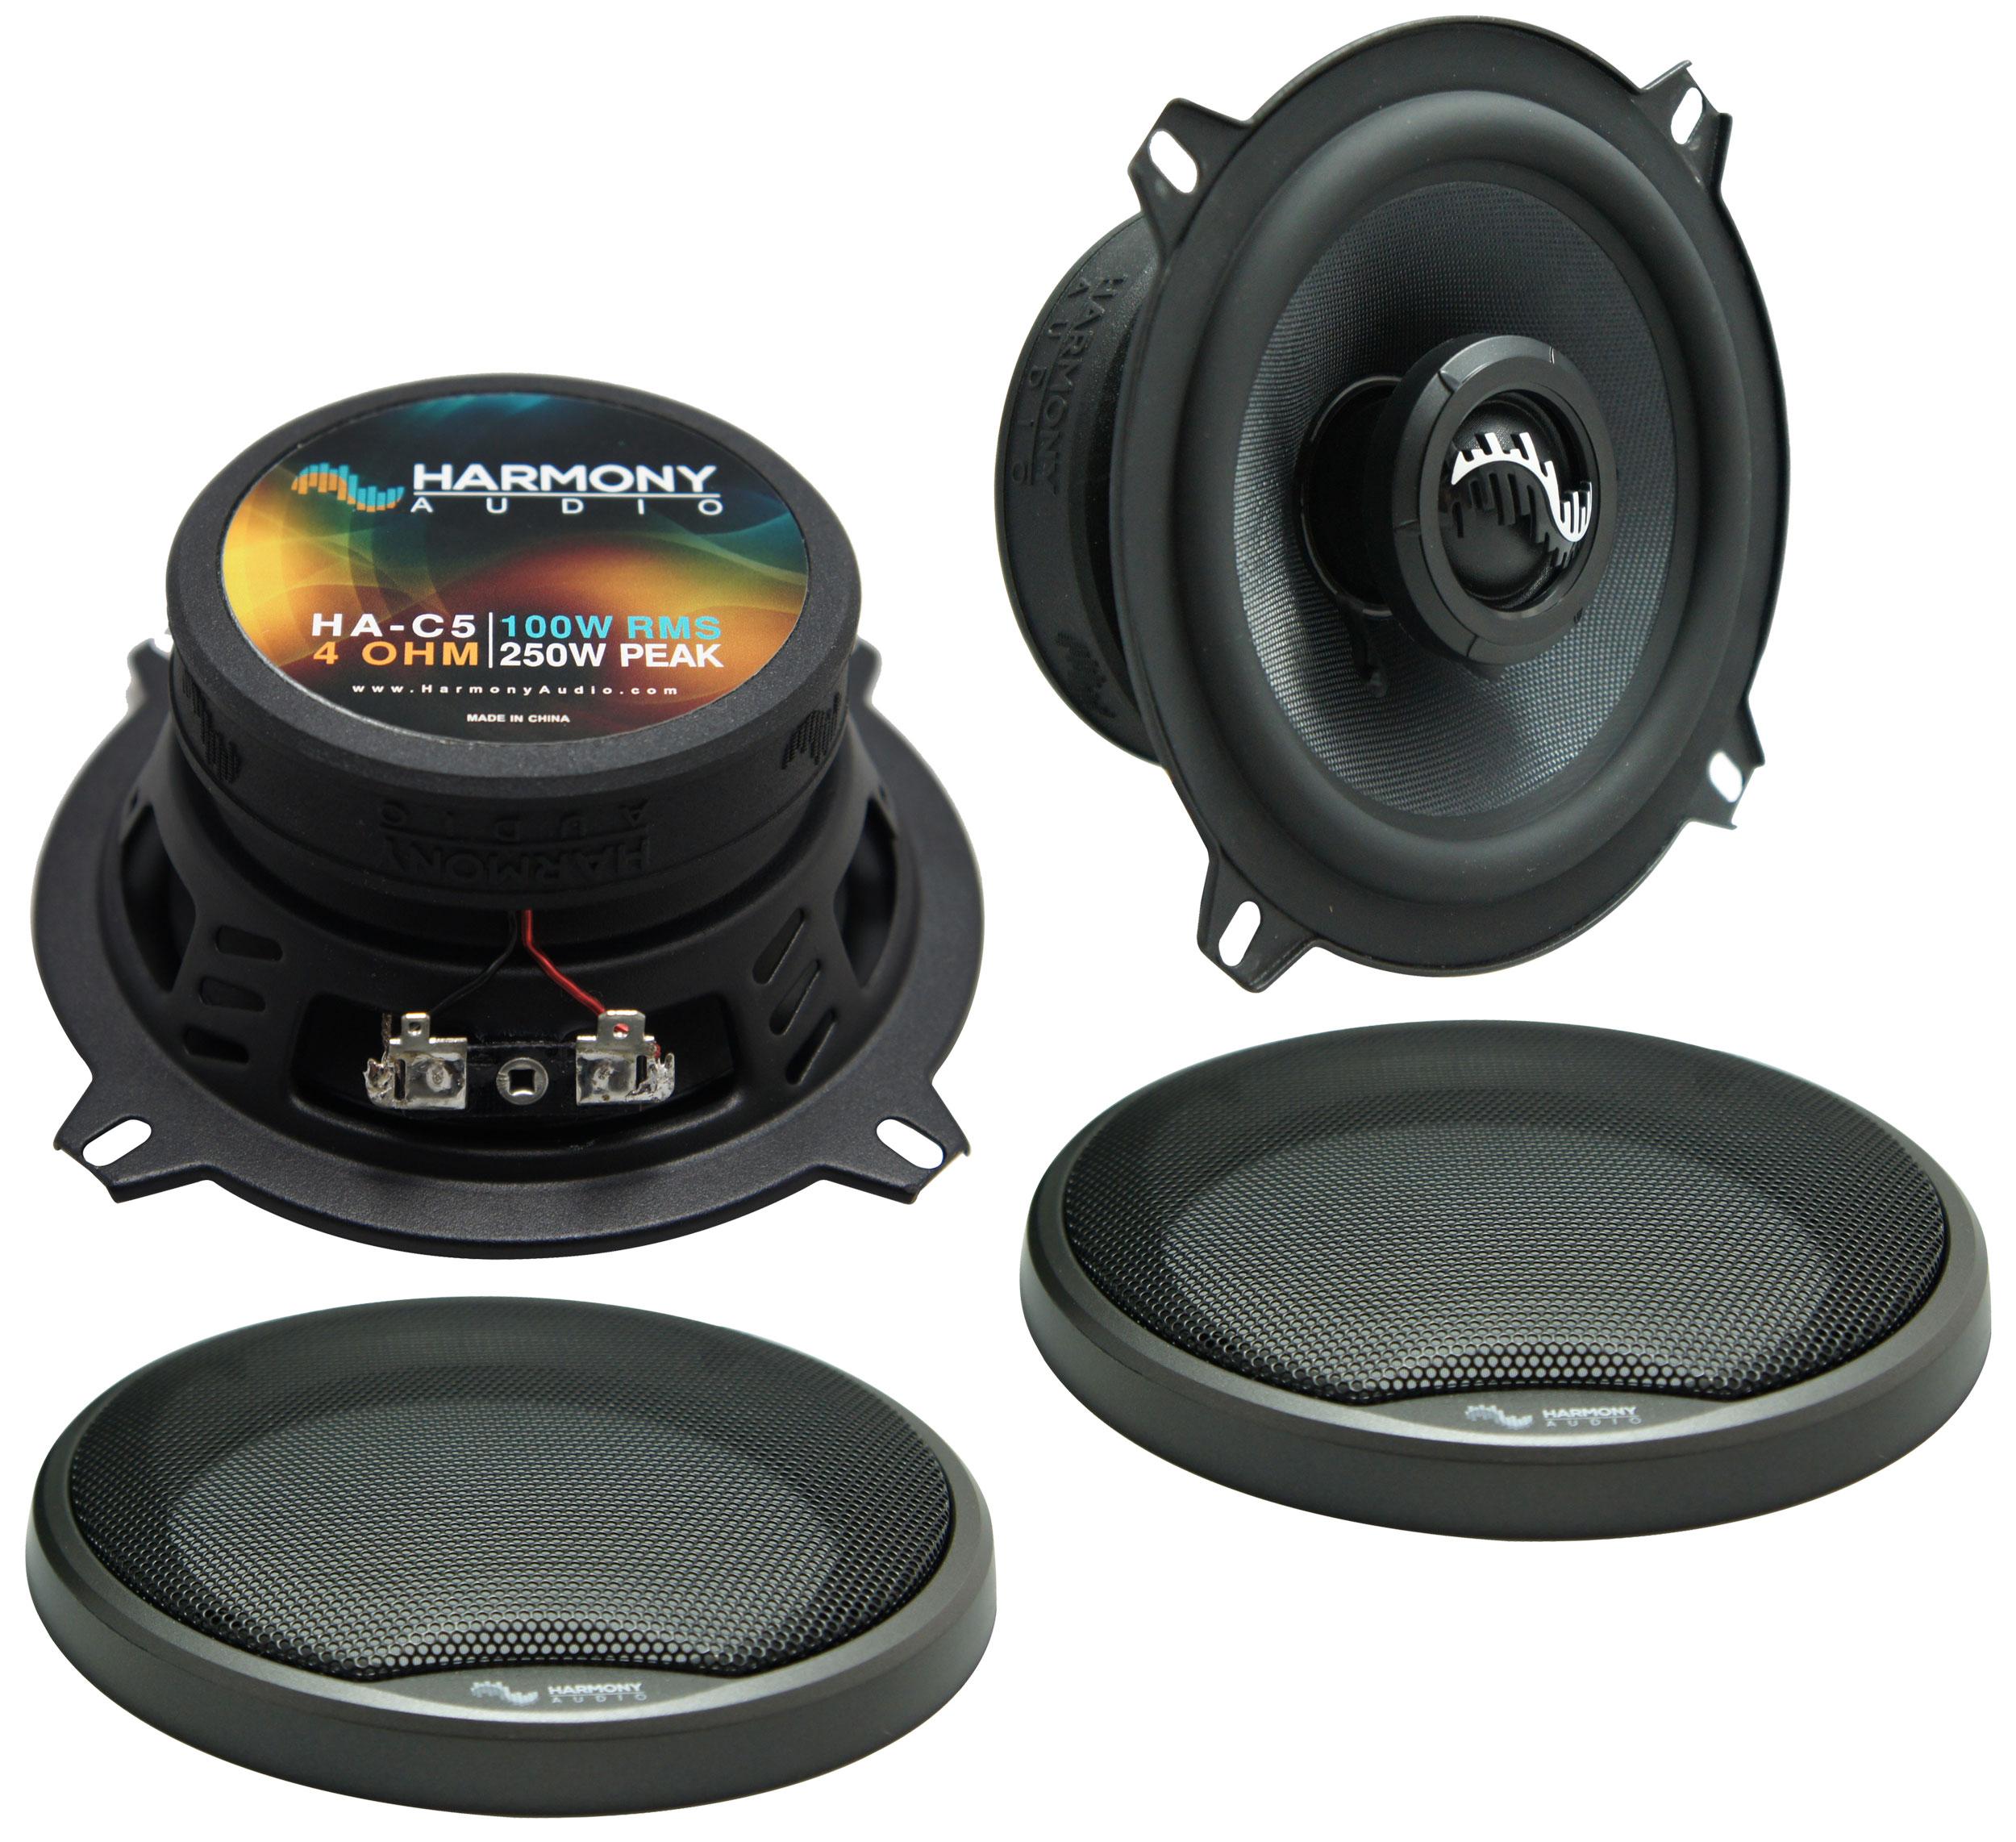 Fits Jeep CJ-7 1979-1988 Front Dash Replacement Harmony Speaker HA-C5 Premium Speakers